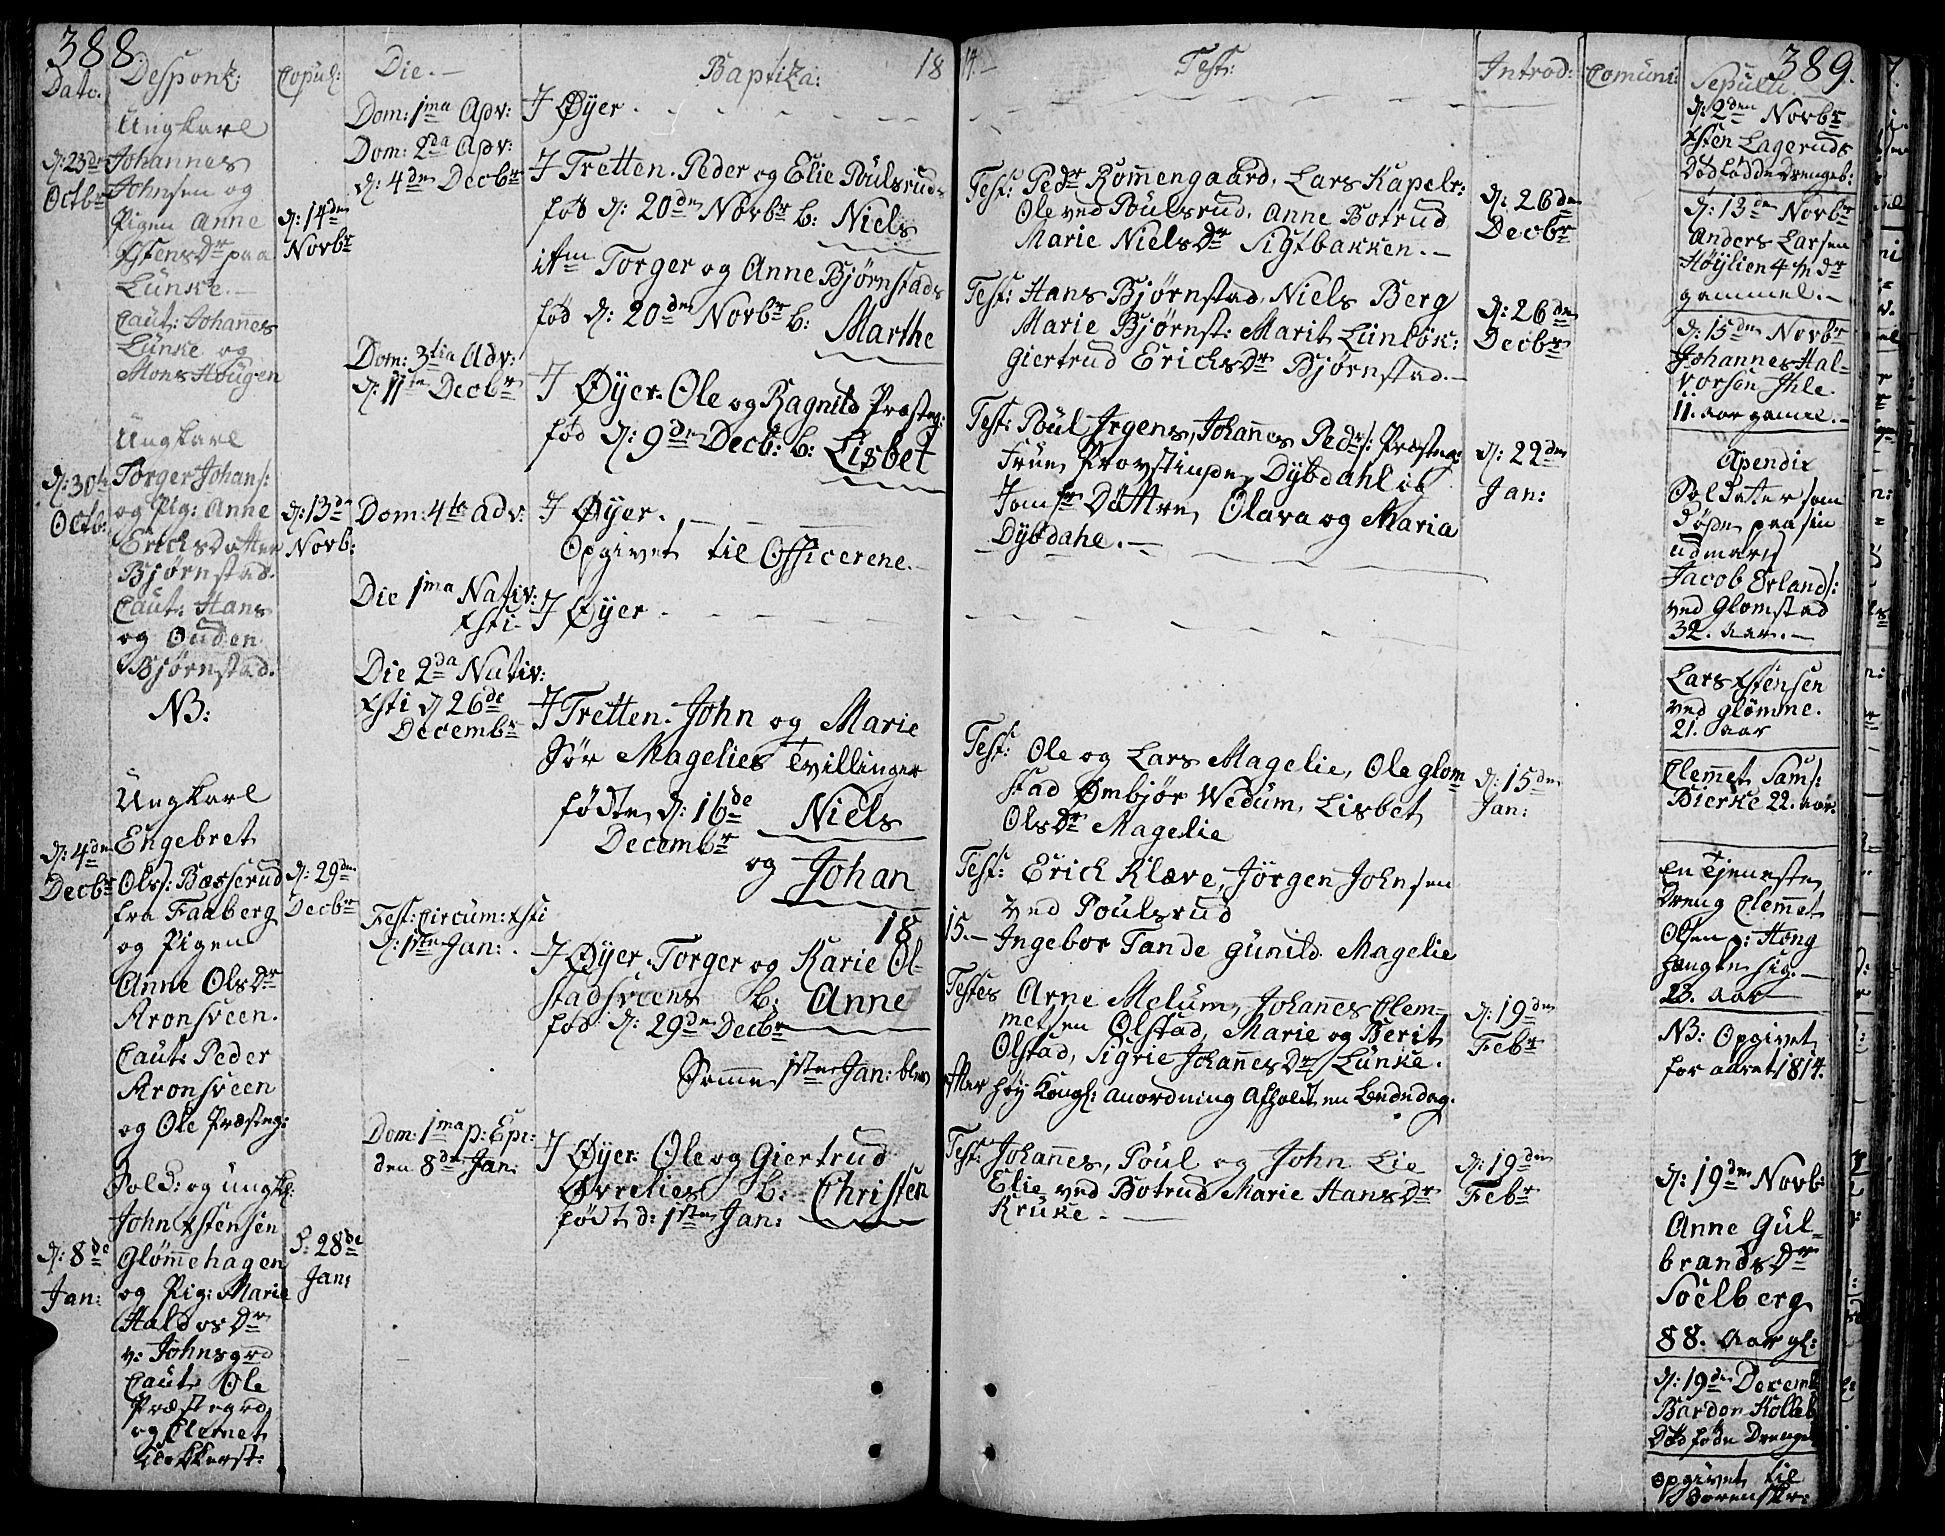 SAH, Øyer prestekontor, Ministerialbok nr. 3, 1784-1824, s. 388-389